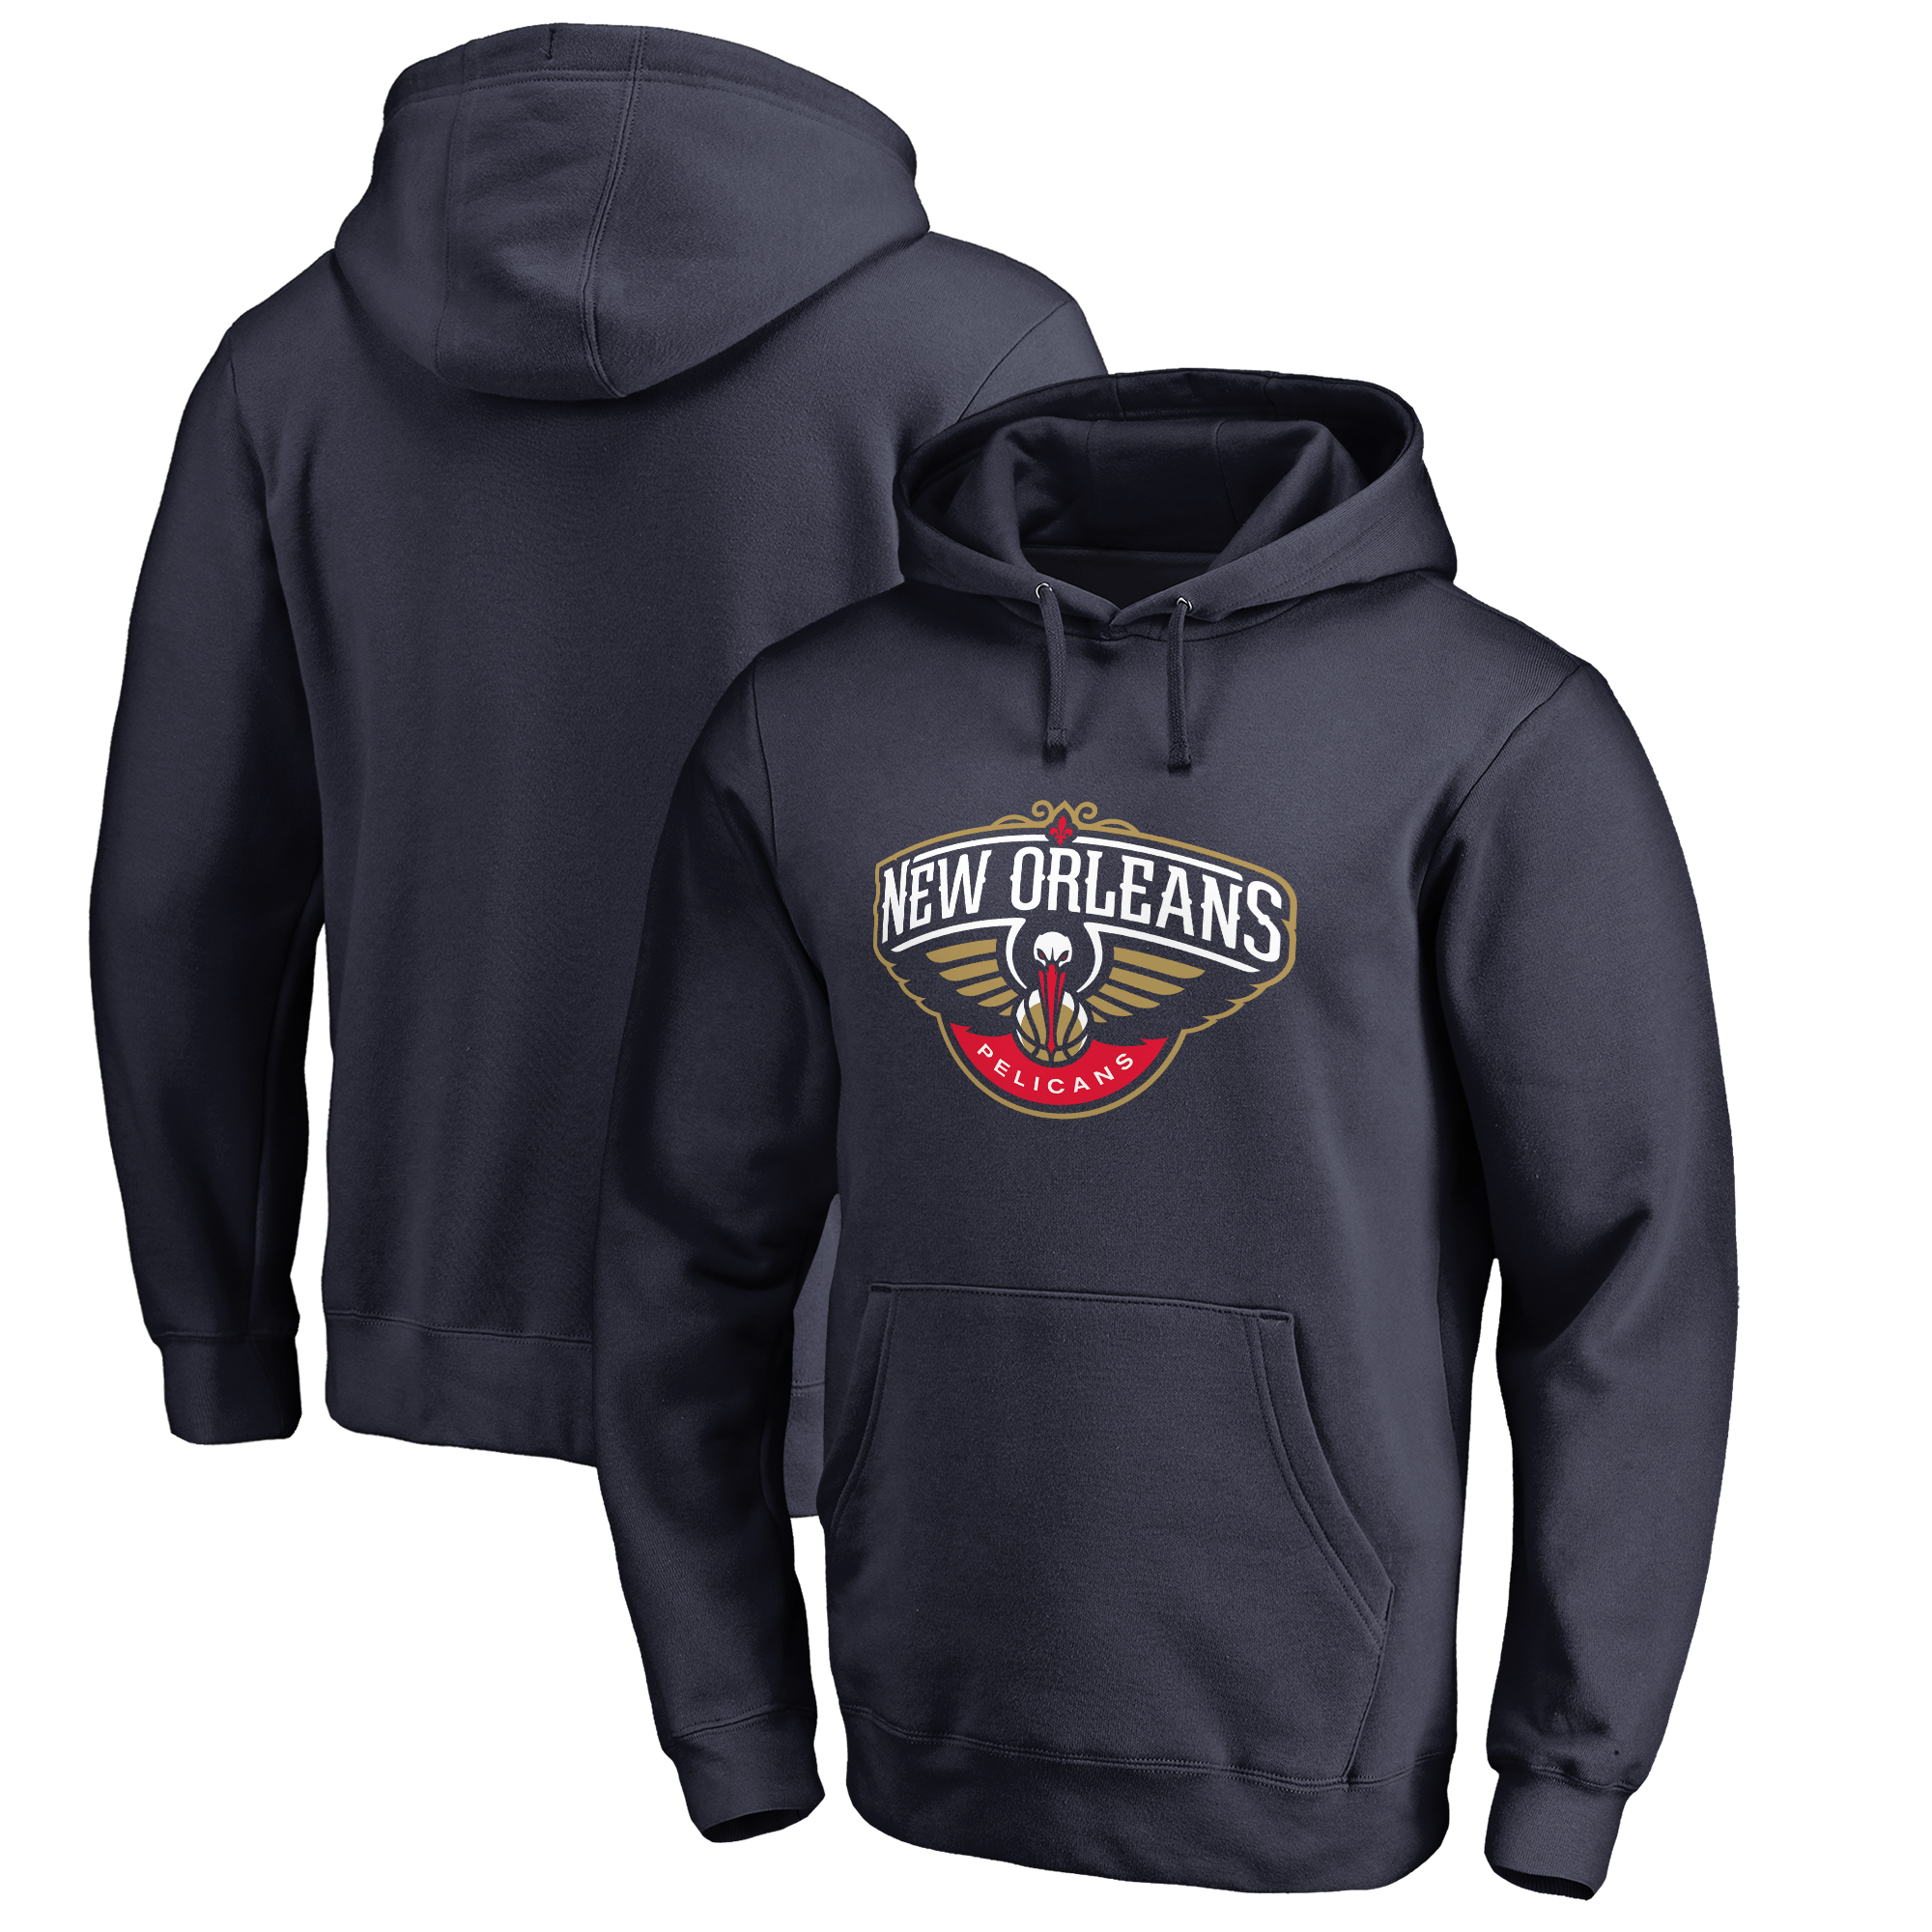 New Orleans Pelicans Primary Logo Pullover Hoodie - Navy